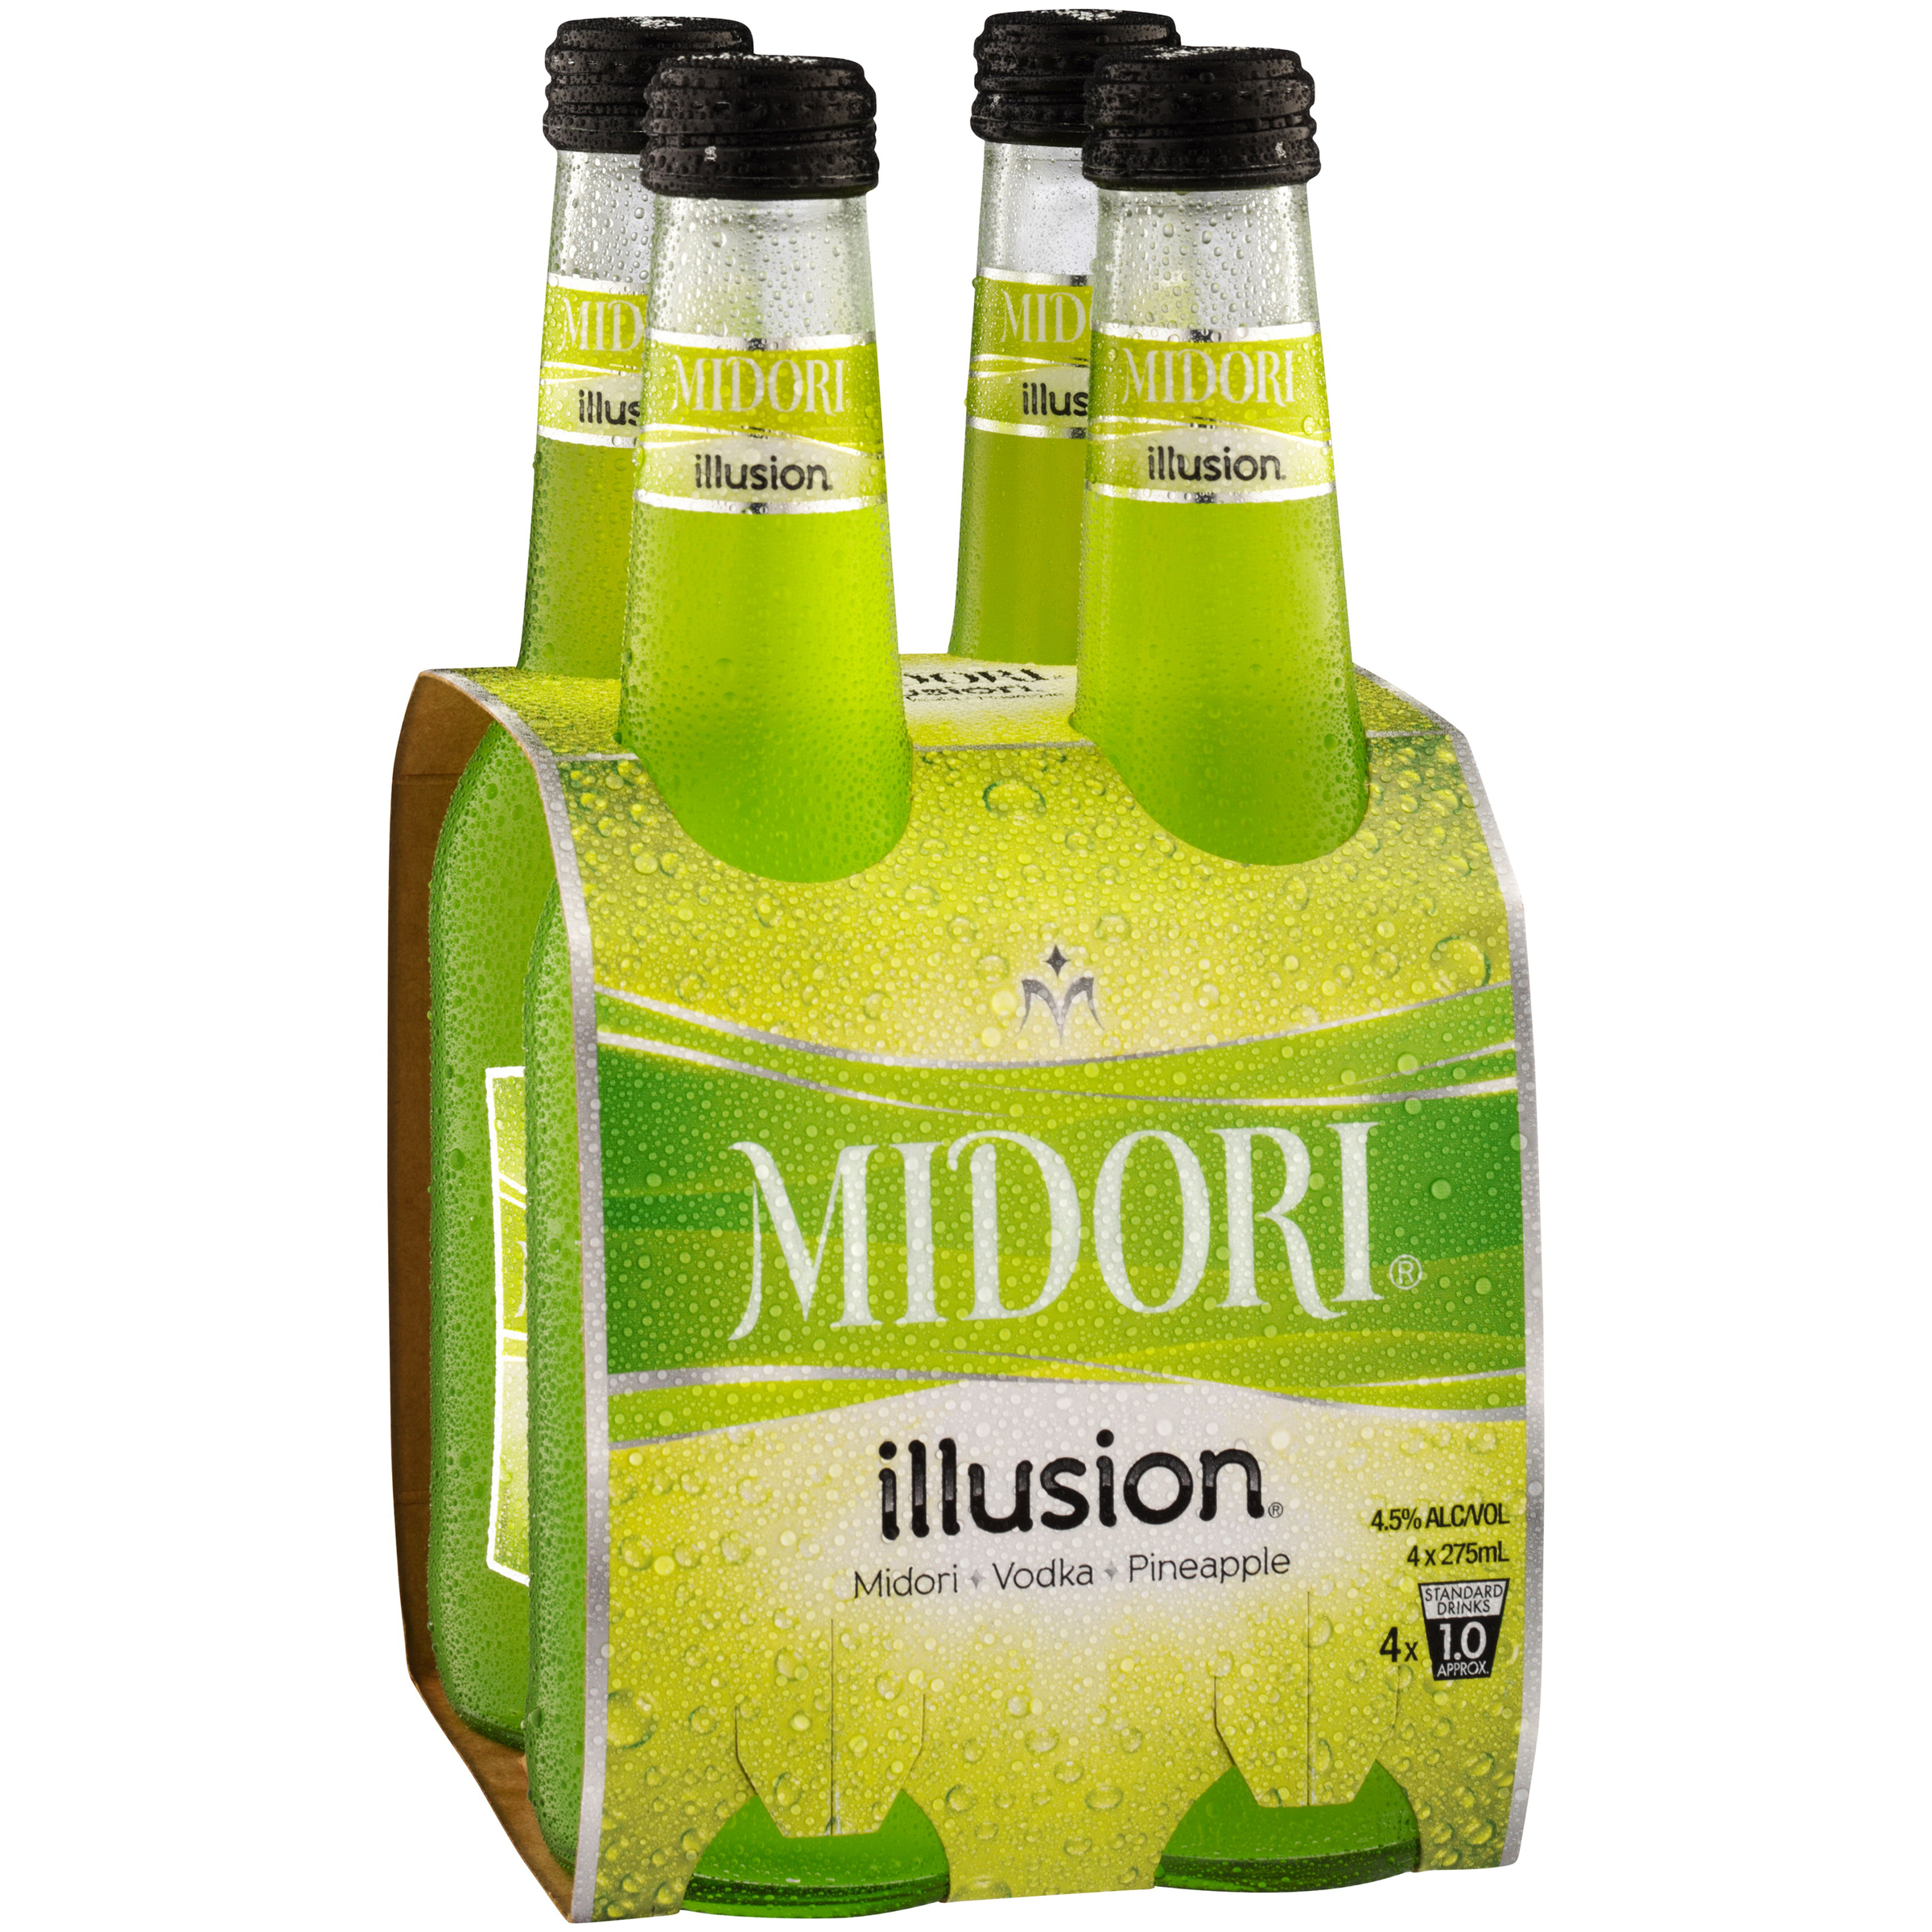 Watch Midori video